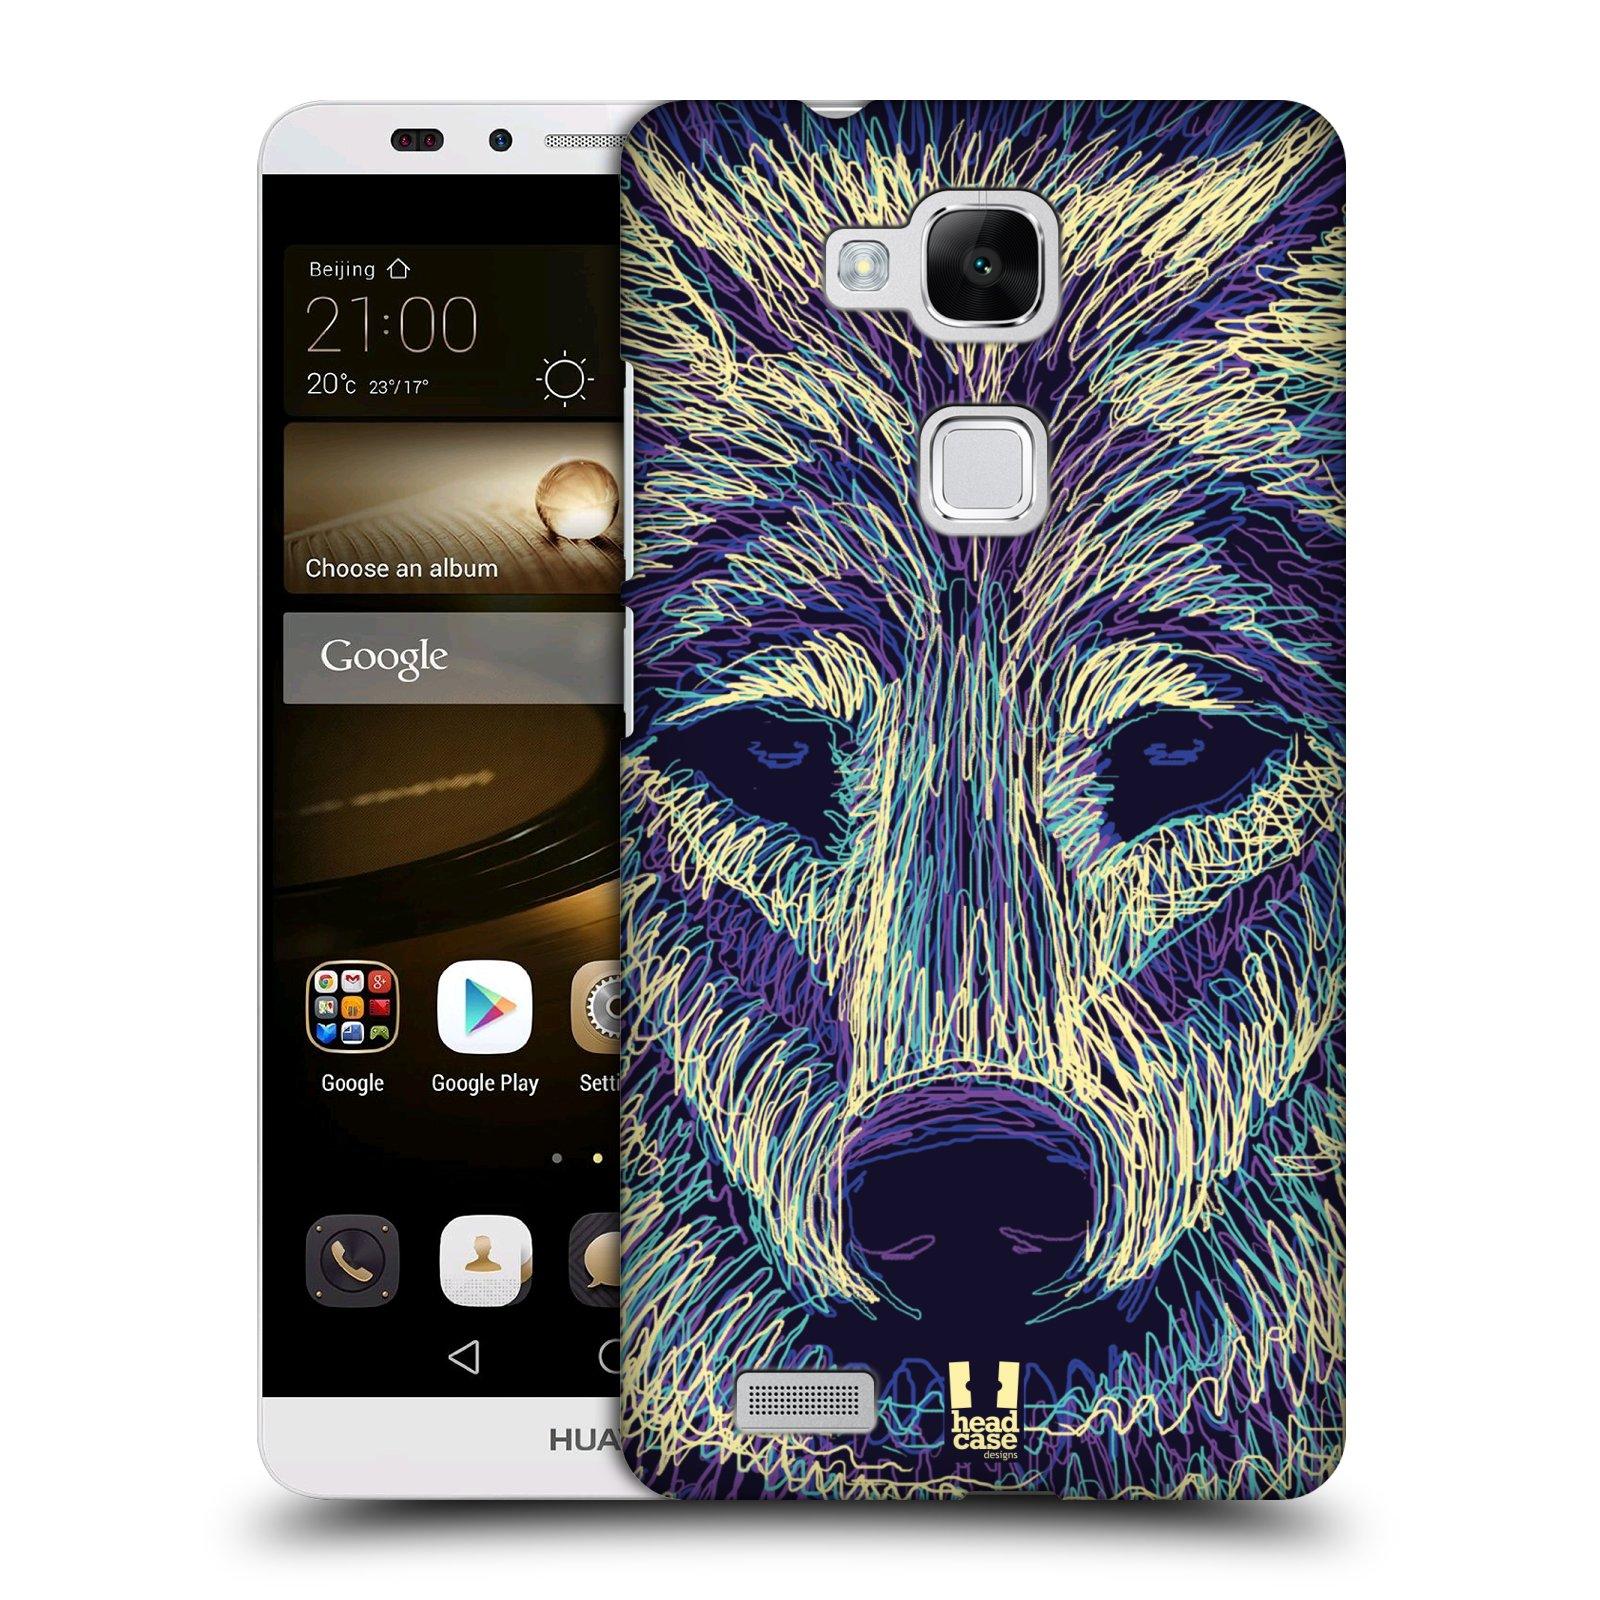 HEAD CASE plastový obal na mobil Huawei Mate 7 vzor zvíře čmáranice vlk